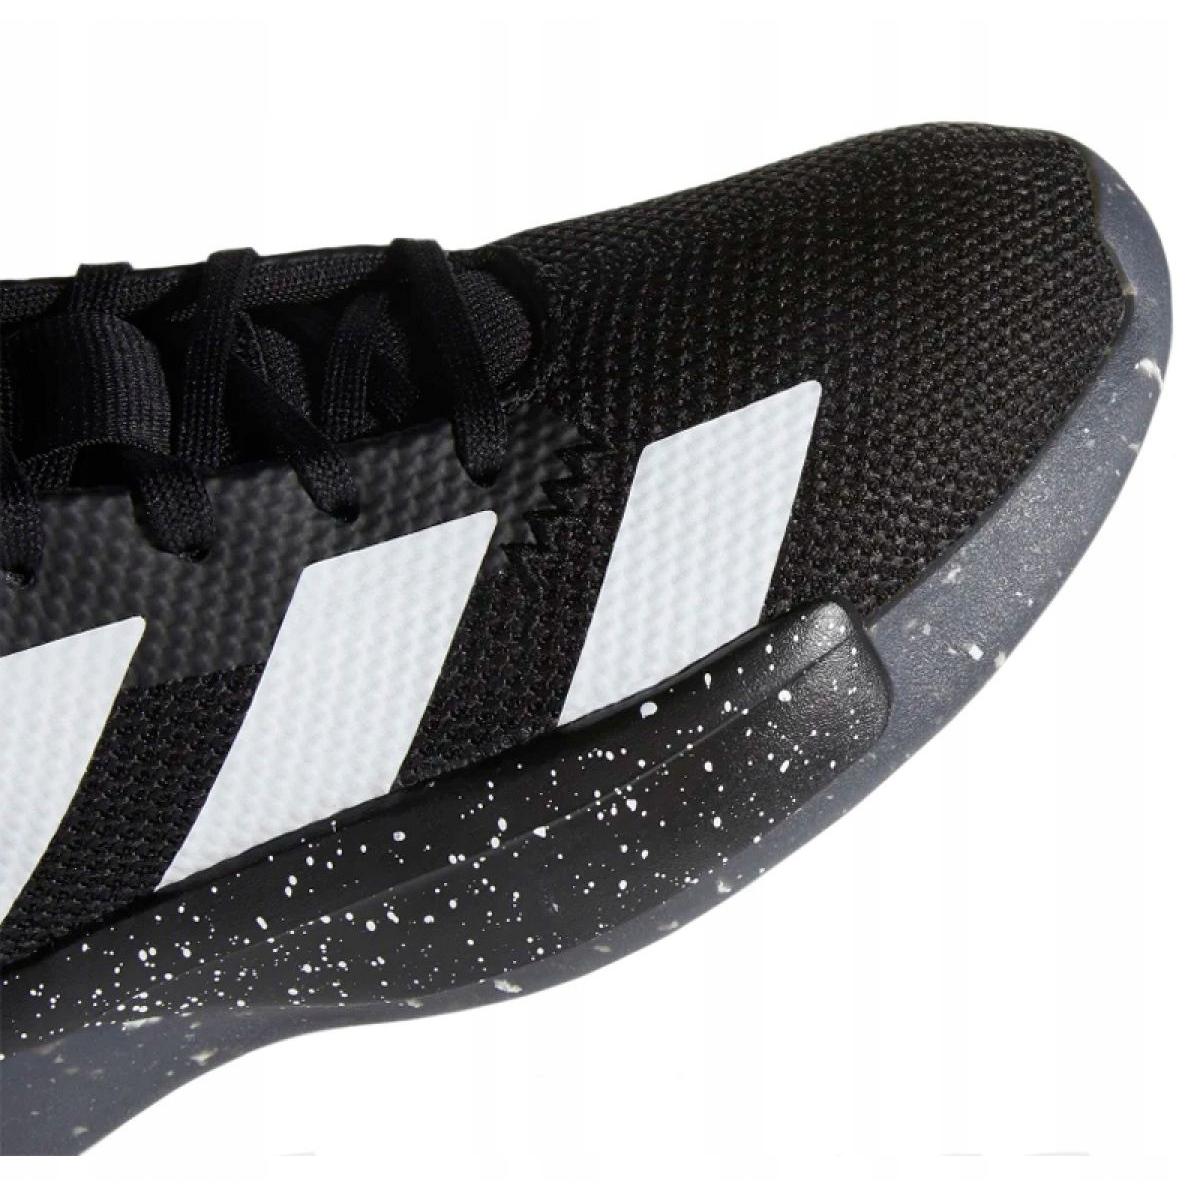 Adidas Pro Next 2019 M EF9845 cipő fekete fekete